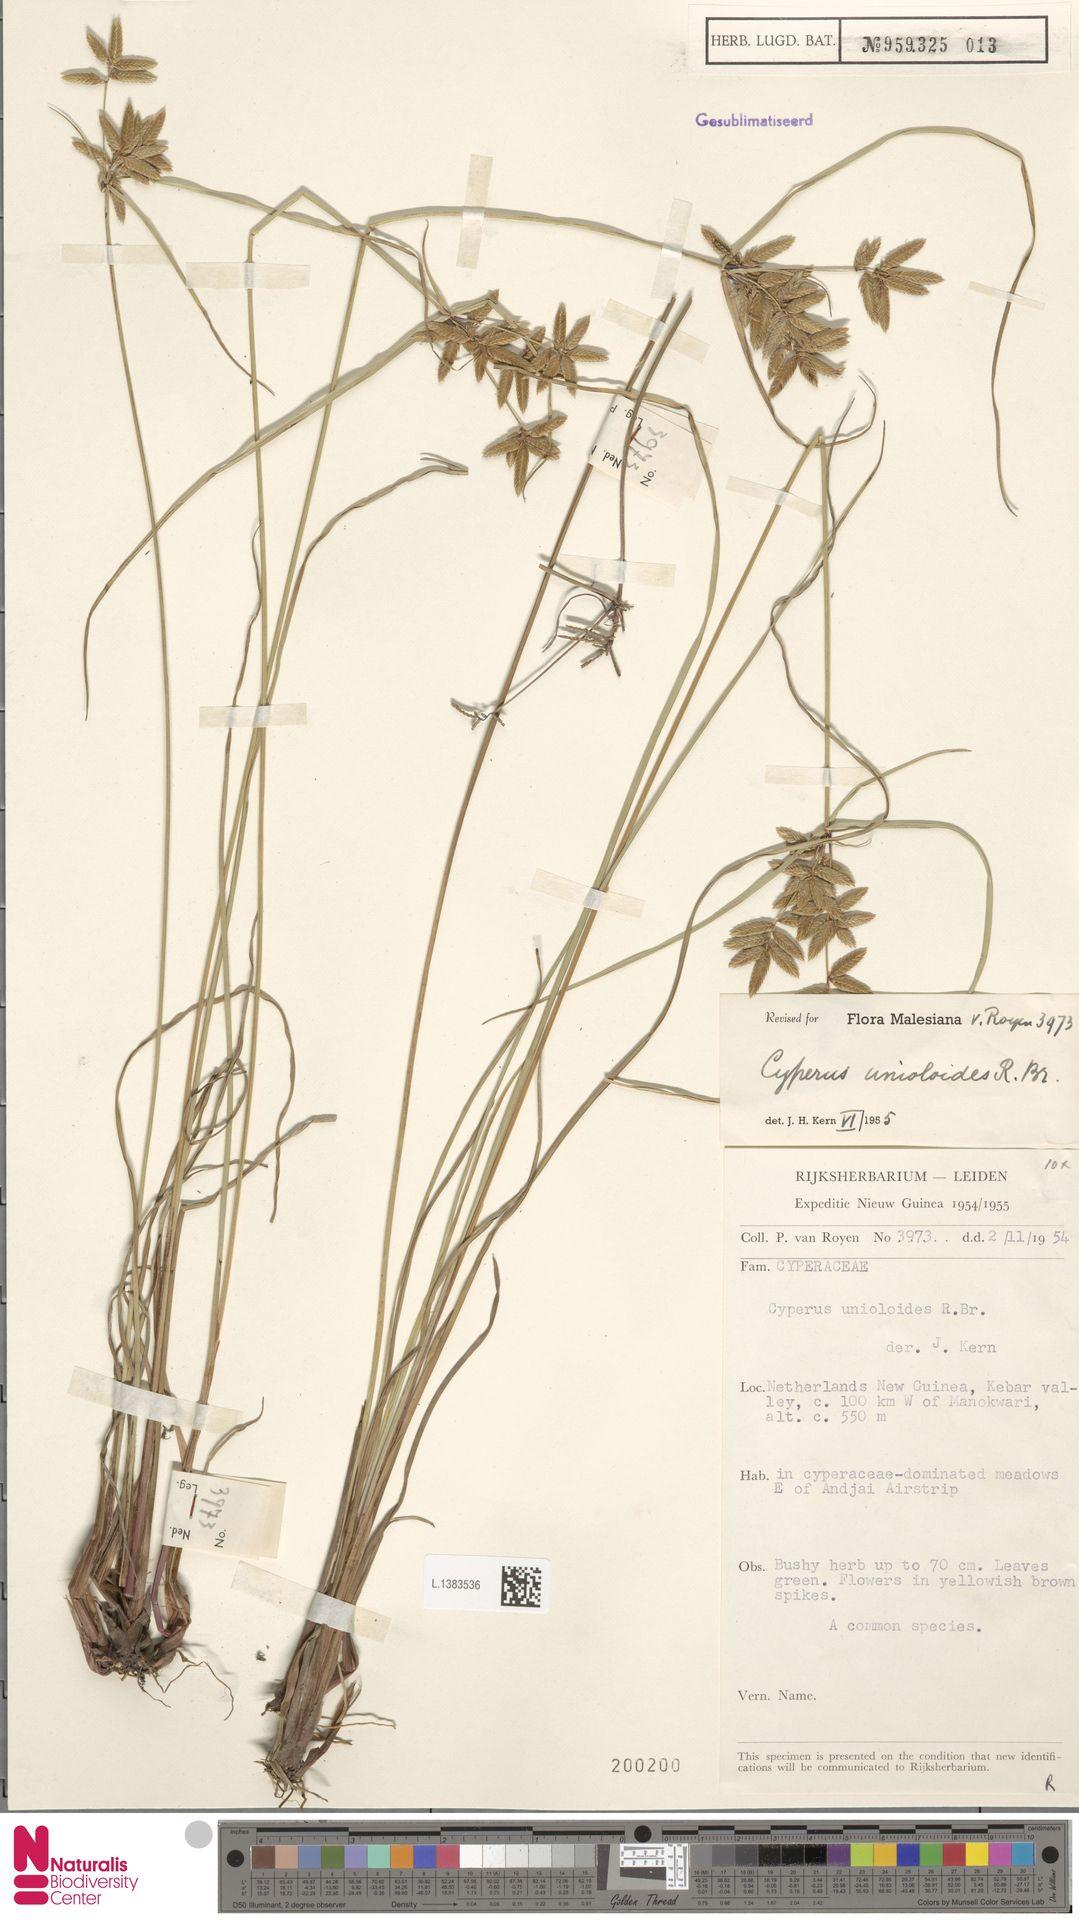 L.1383536   Cyperus unioloides R.Br.